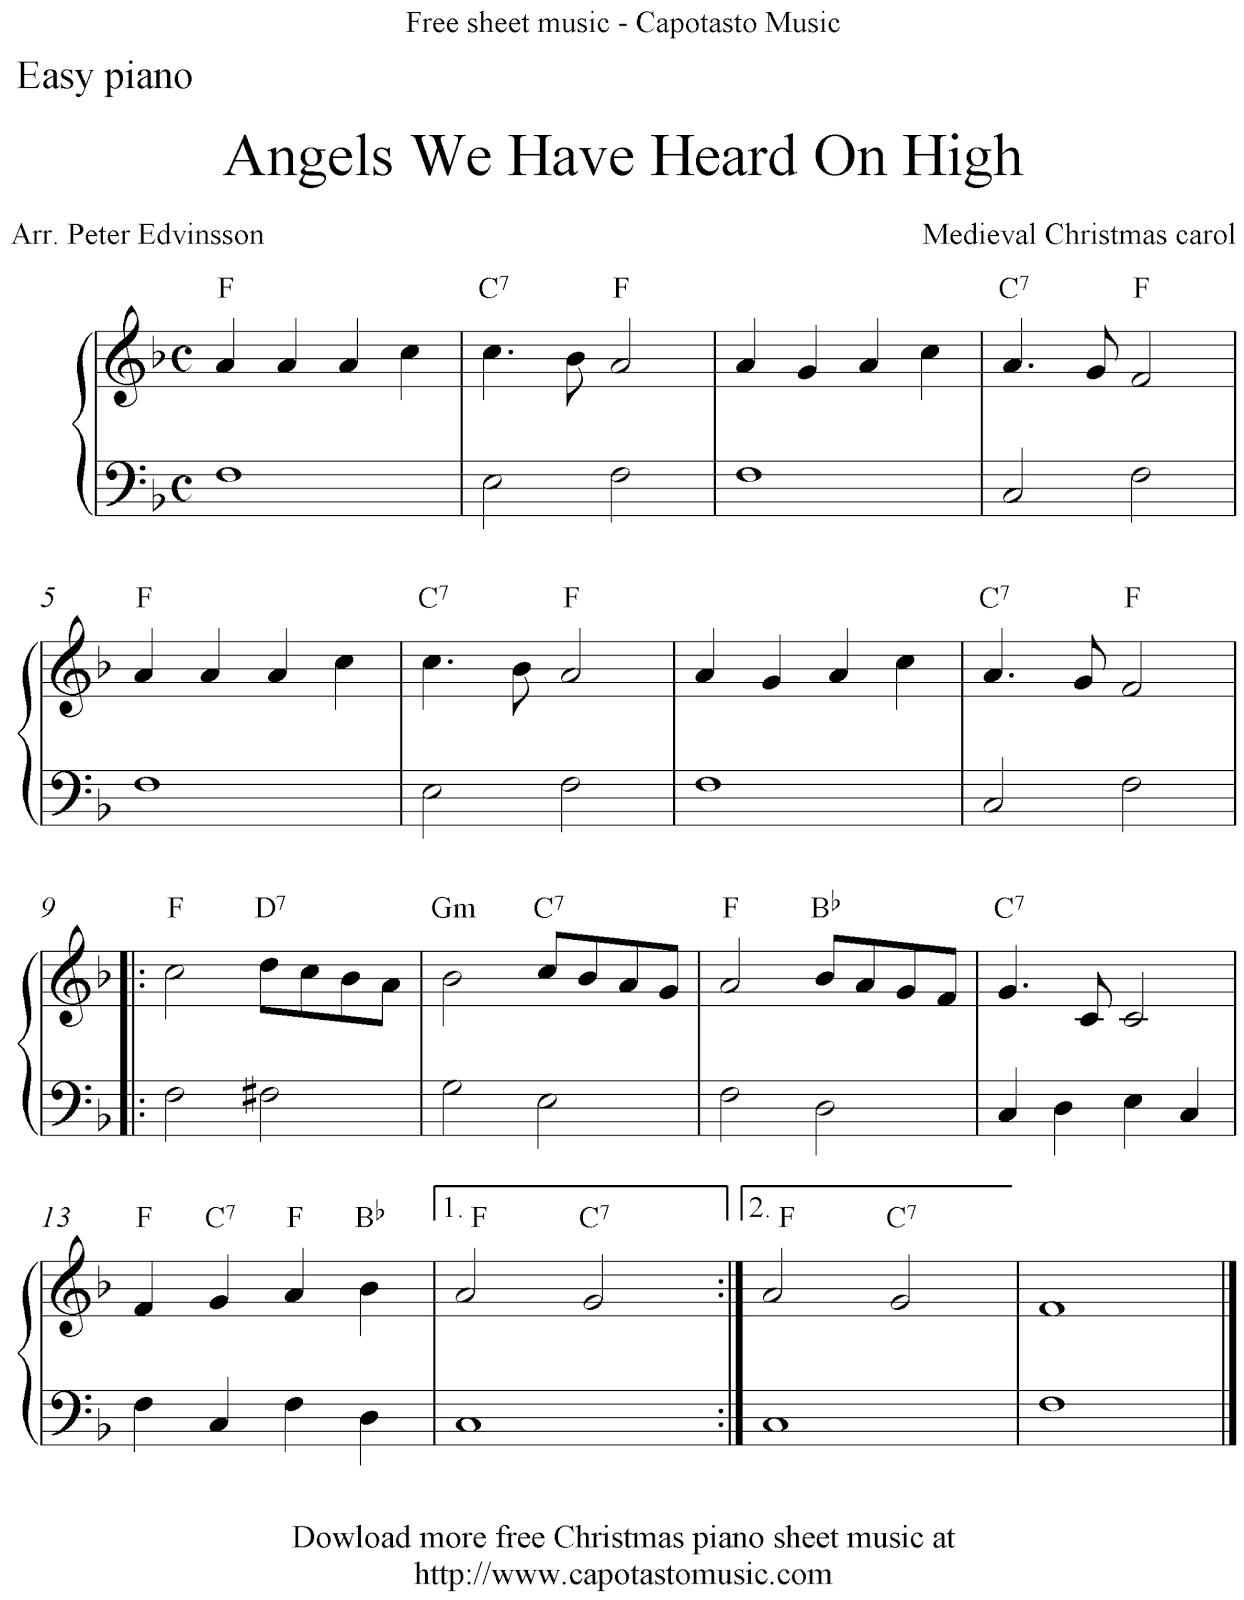 ... Heard On High. Free printable Christmas sheet music for easy piano